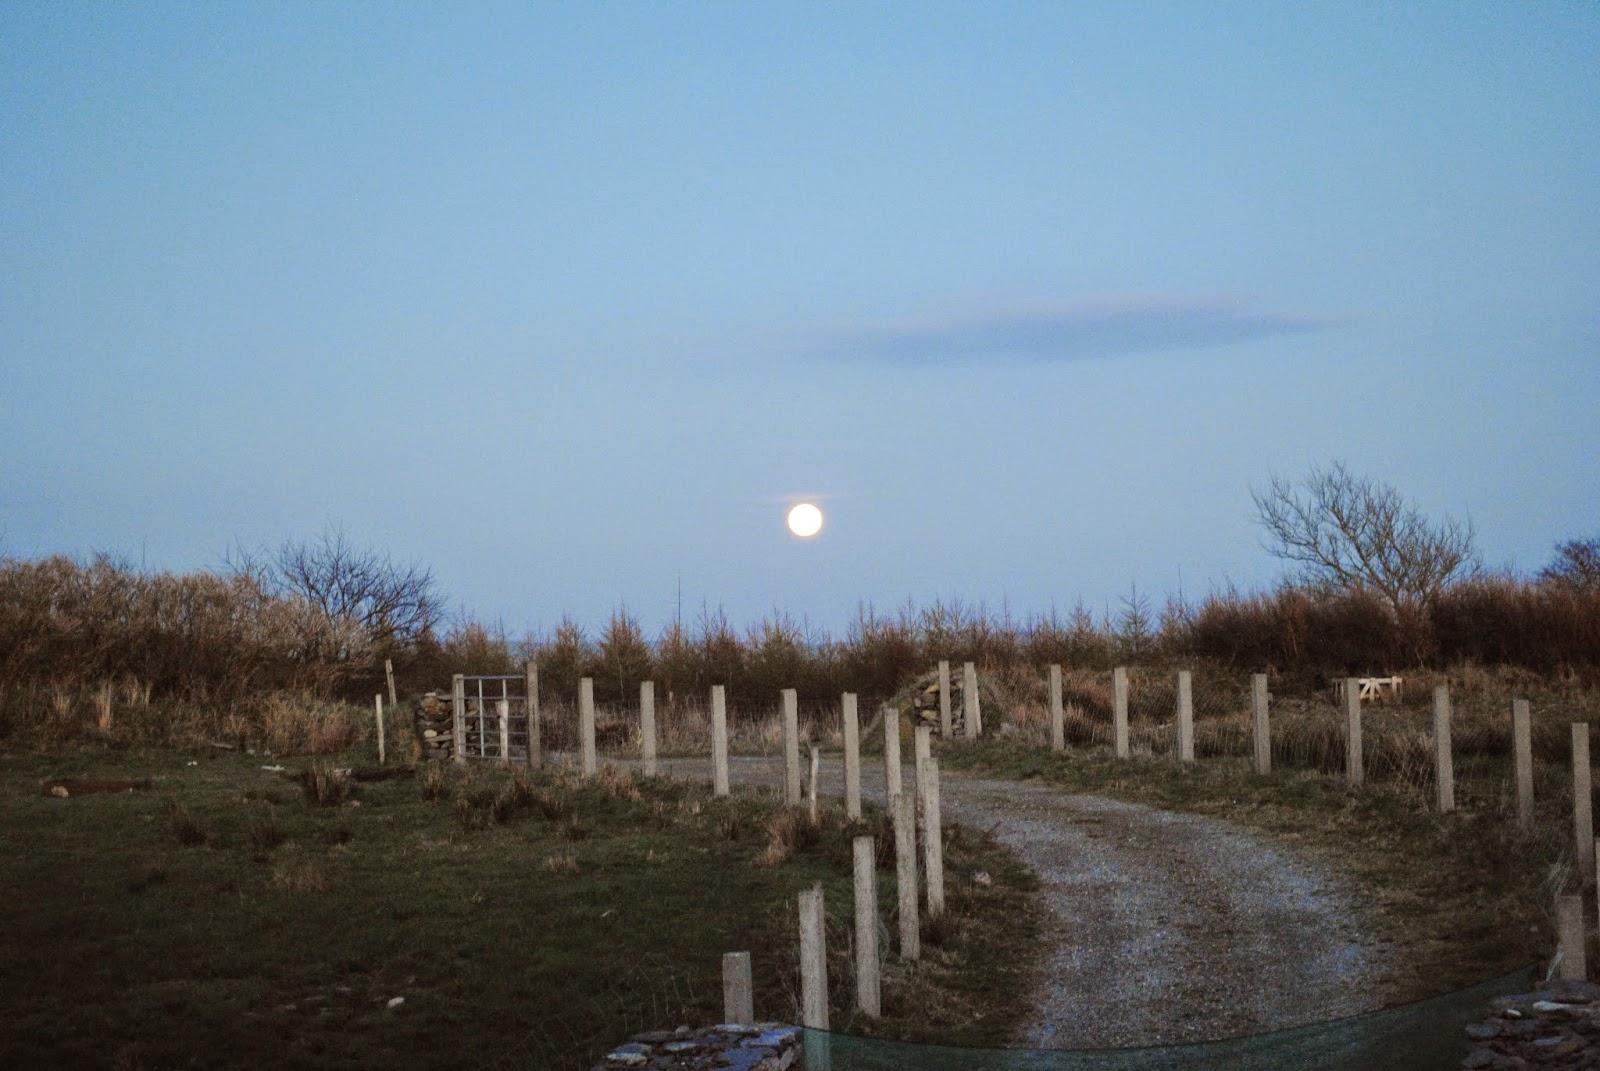 Full Moon Eclipse, 4th April 2015